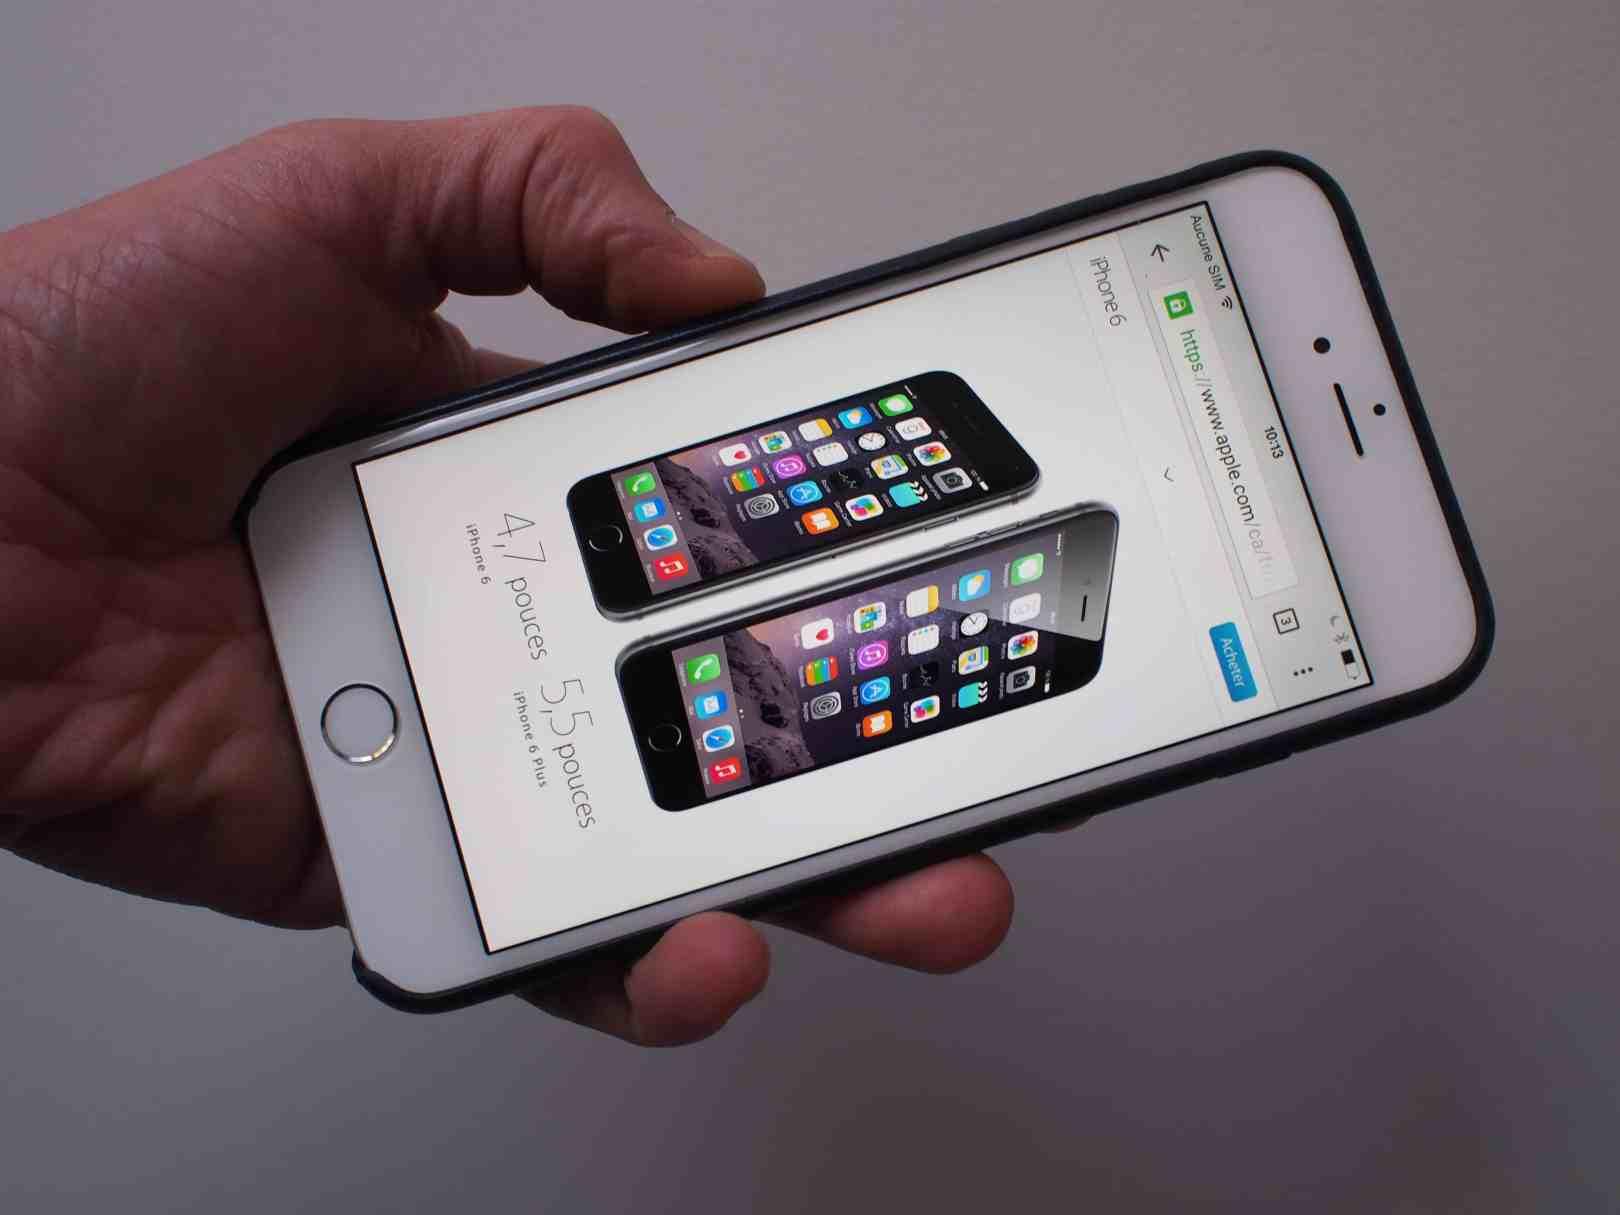 téléphone iPhone 6 plus apple